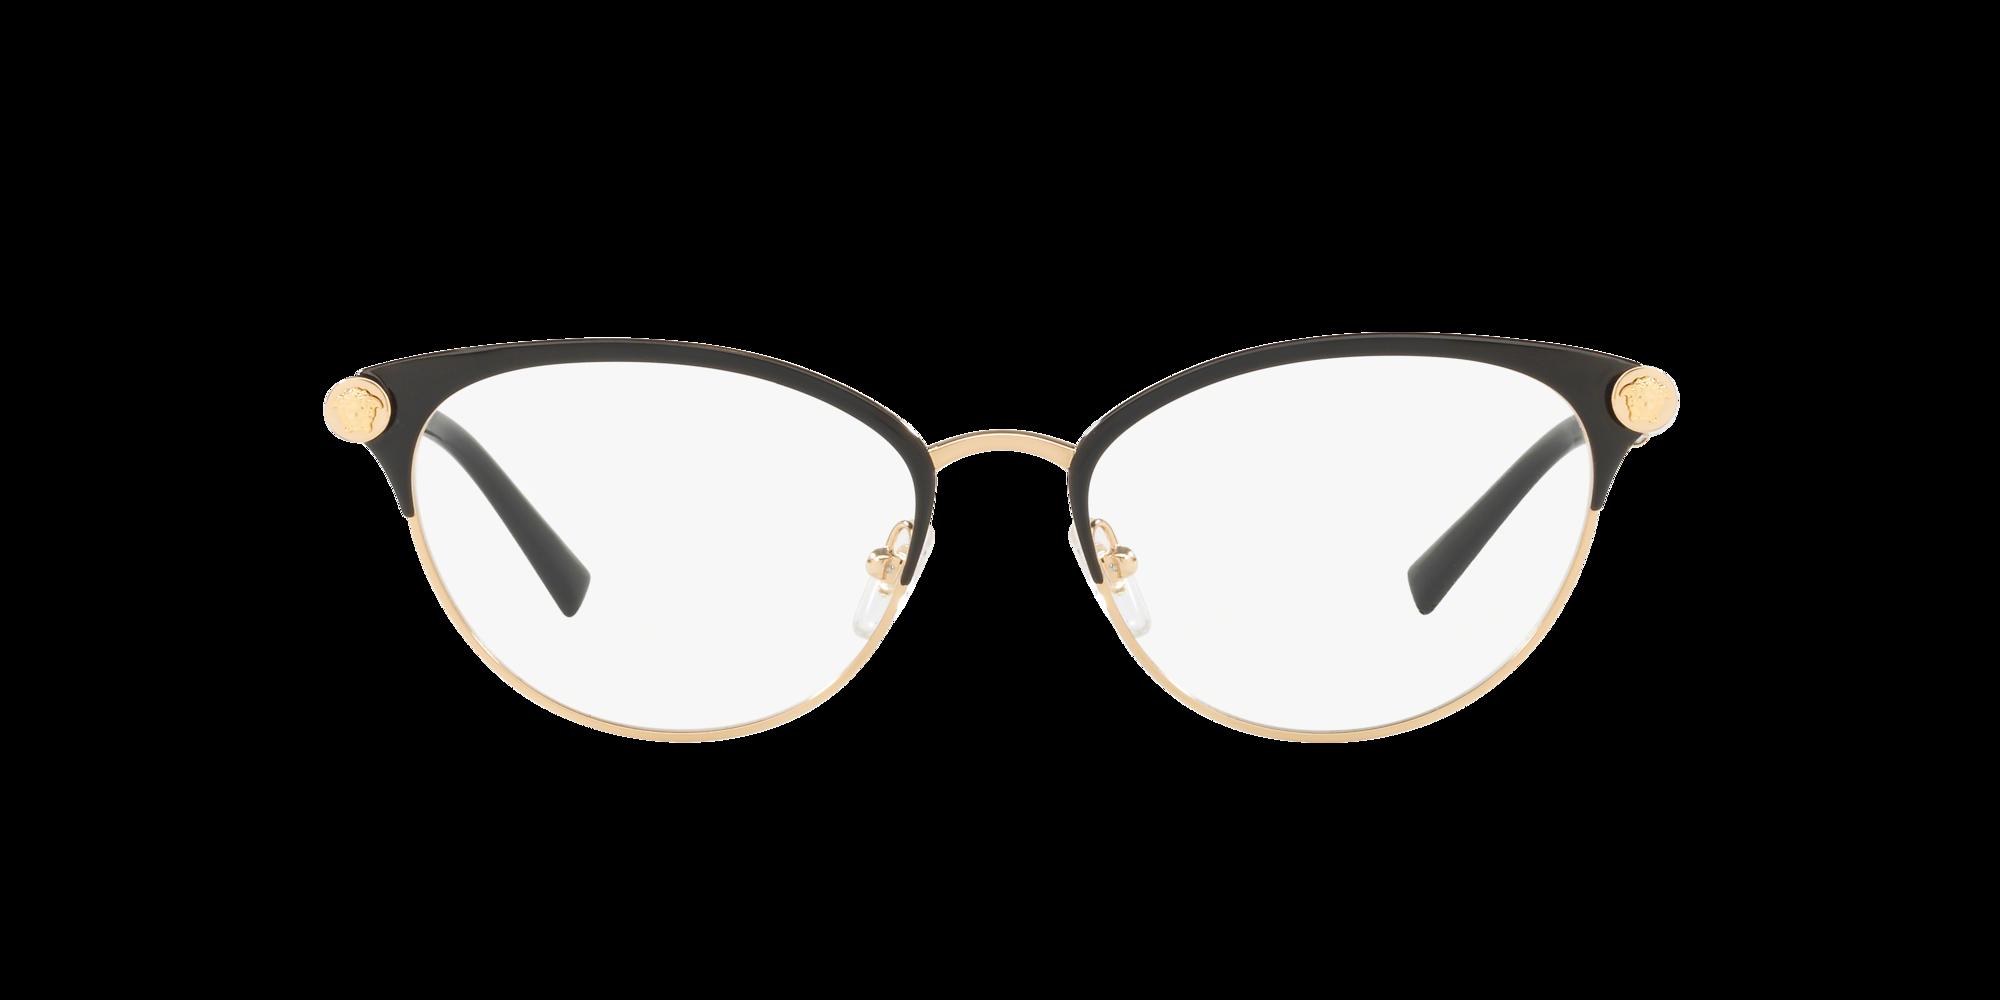 Image for VE1259Q from LensCrafters | Glasses, Prescription Glasses Online, Eyewear